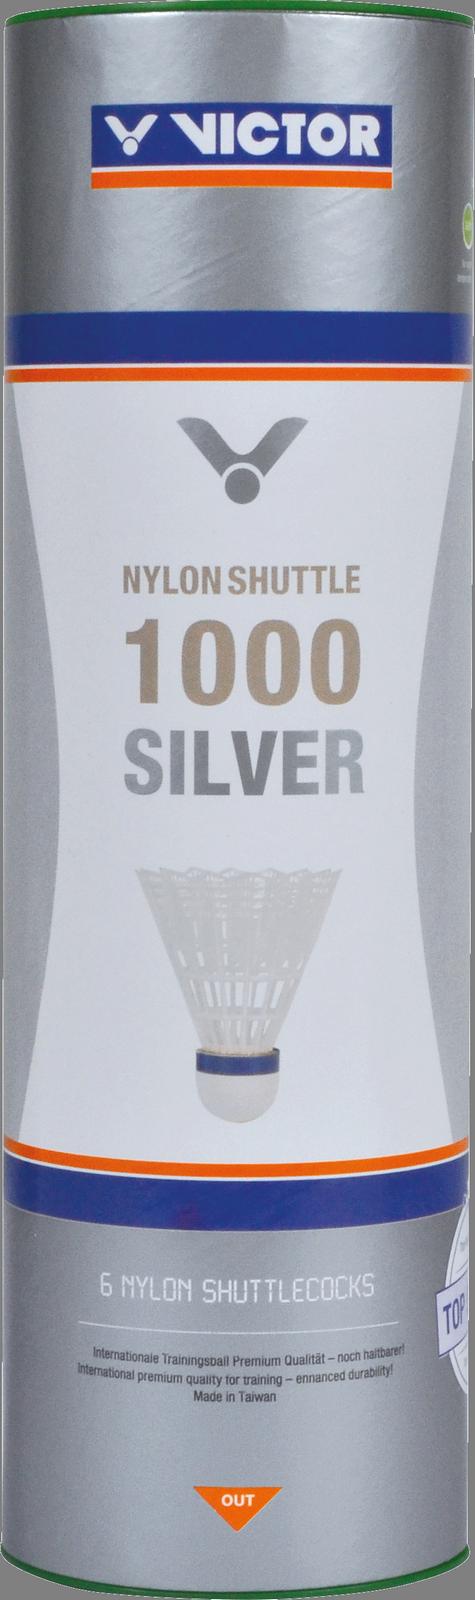 VICTOR Nylonshuttle 1000 medium/yellow